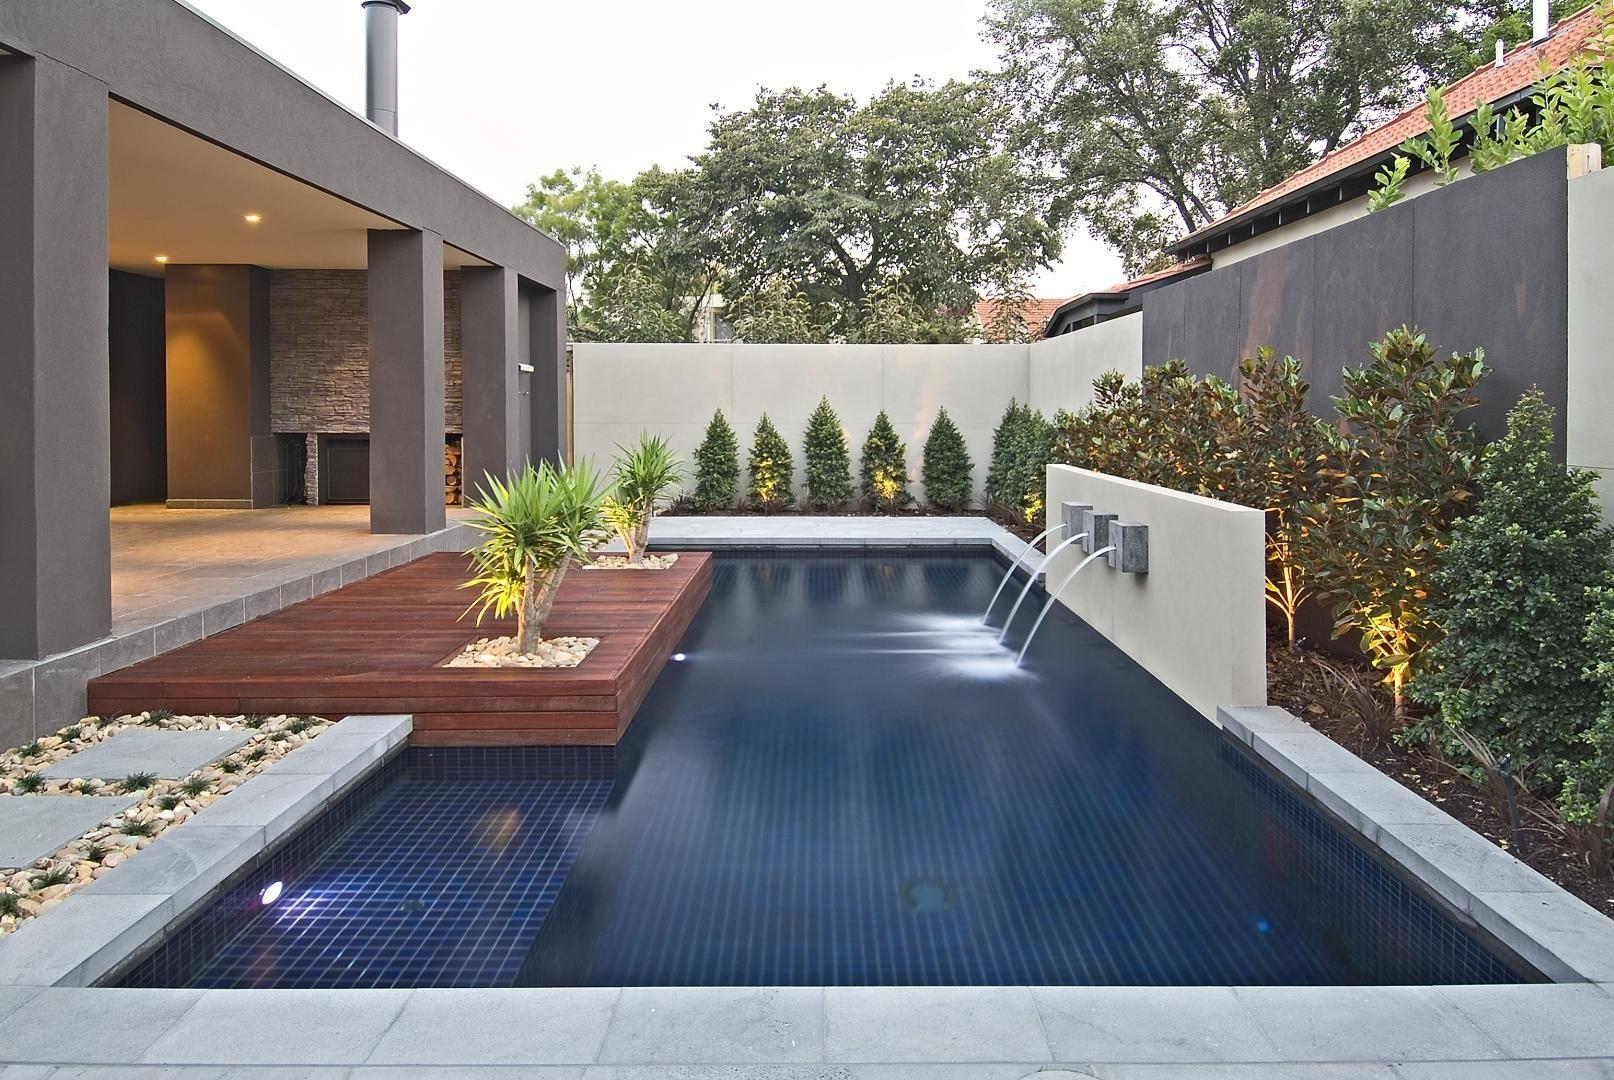 COS Design - Drake Street | Modern backyard, Modern pools ... on Modern Backyard Ideas With Pool id=68936